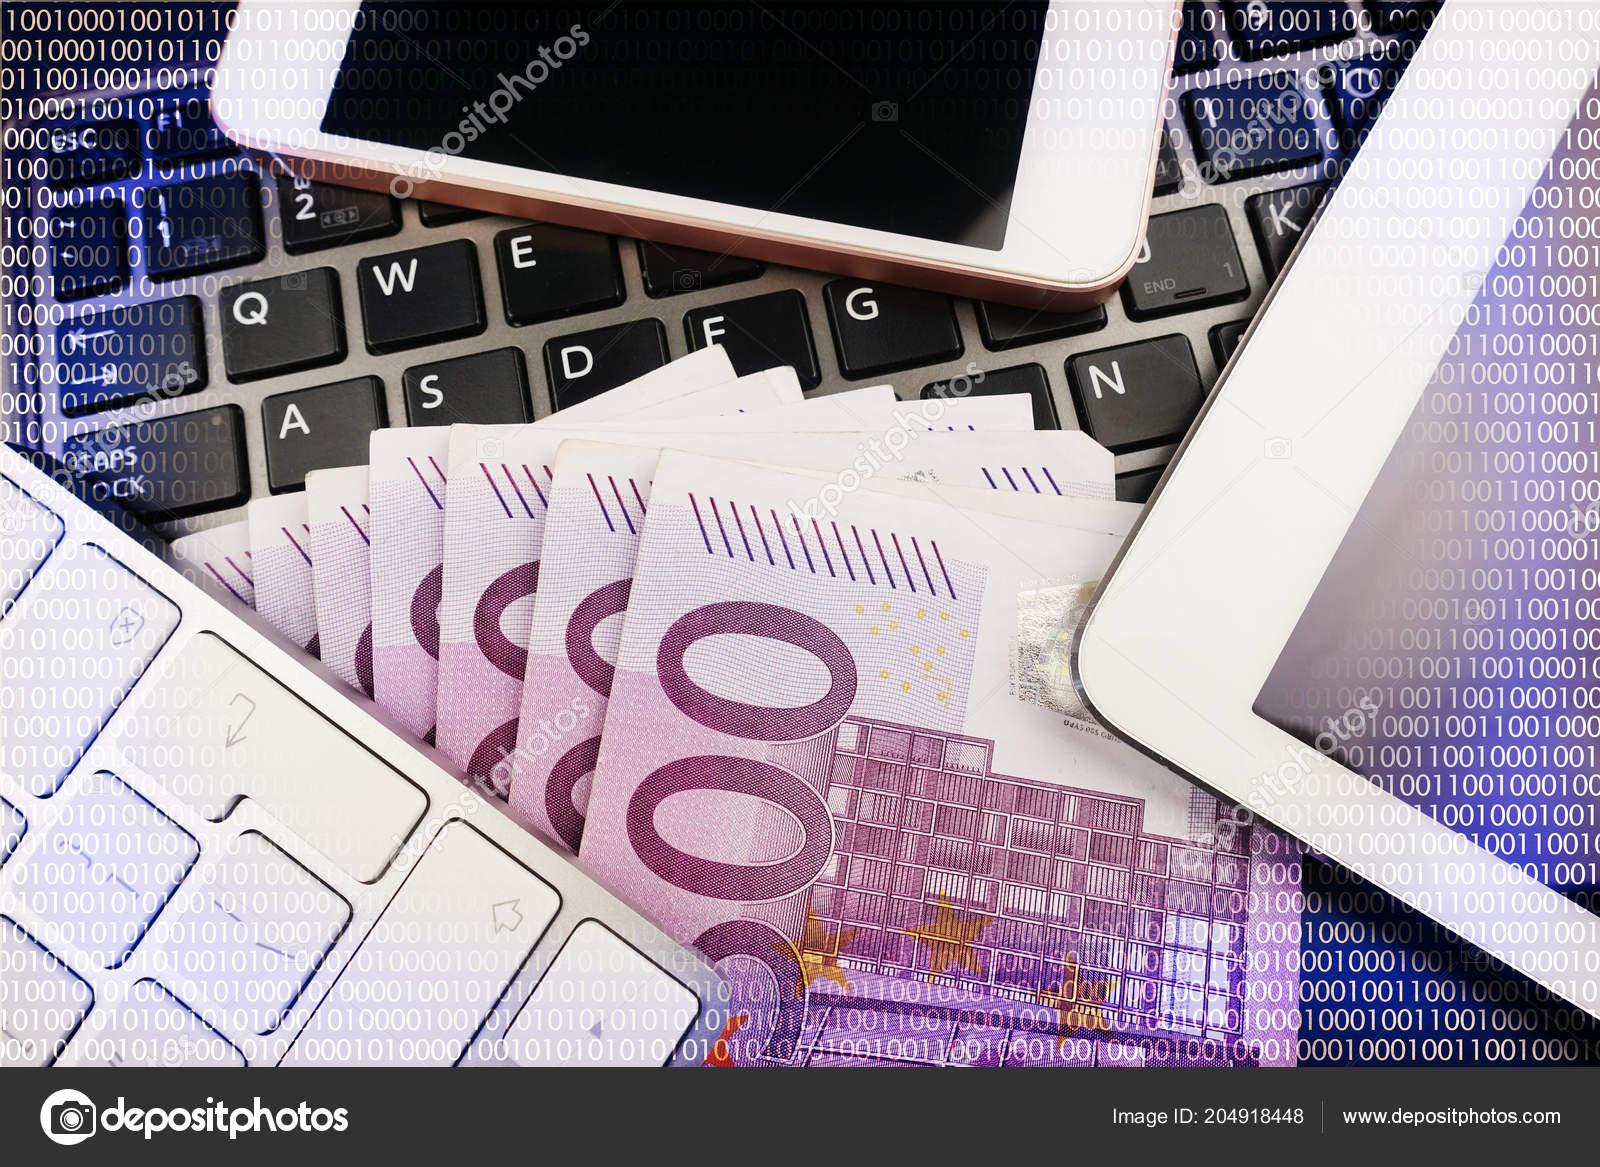 Make Money Online Concept Digital Binary Data Abstract